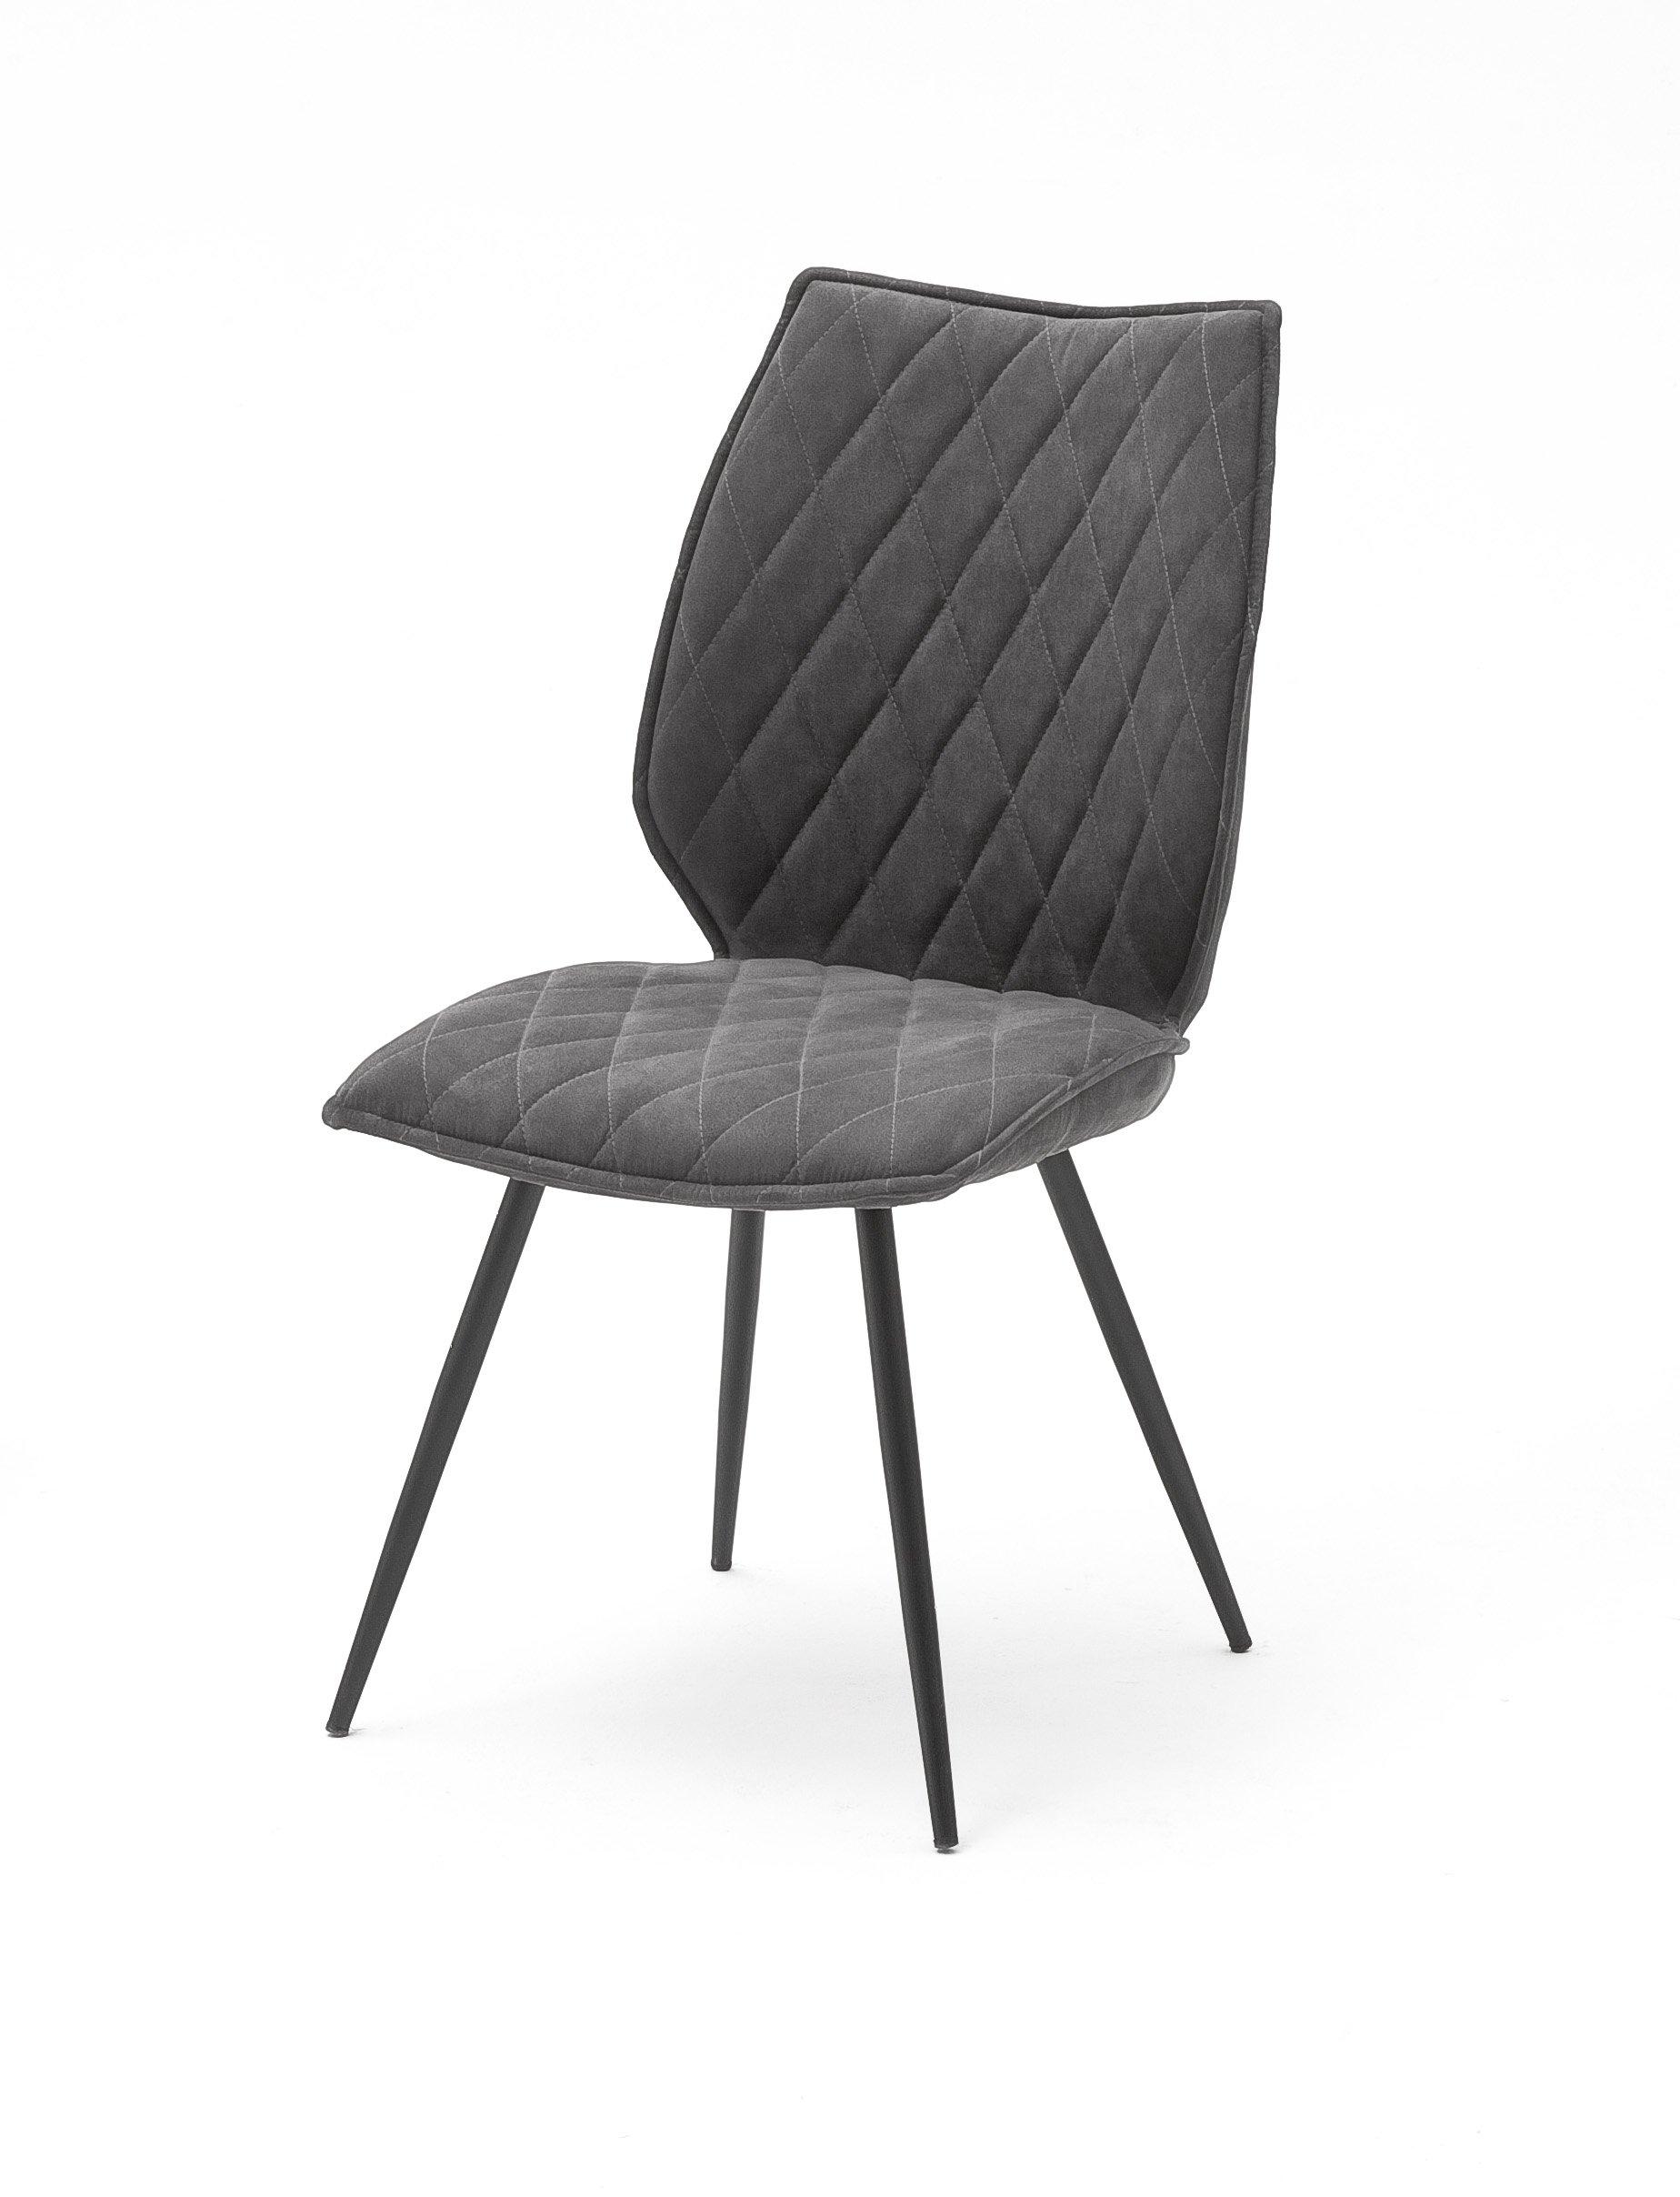 Esszimmer Stuhl Morano von MCA furniture